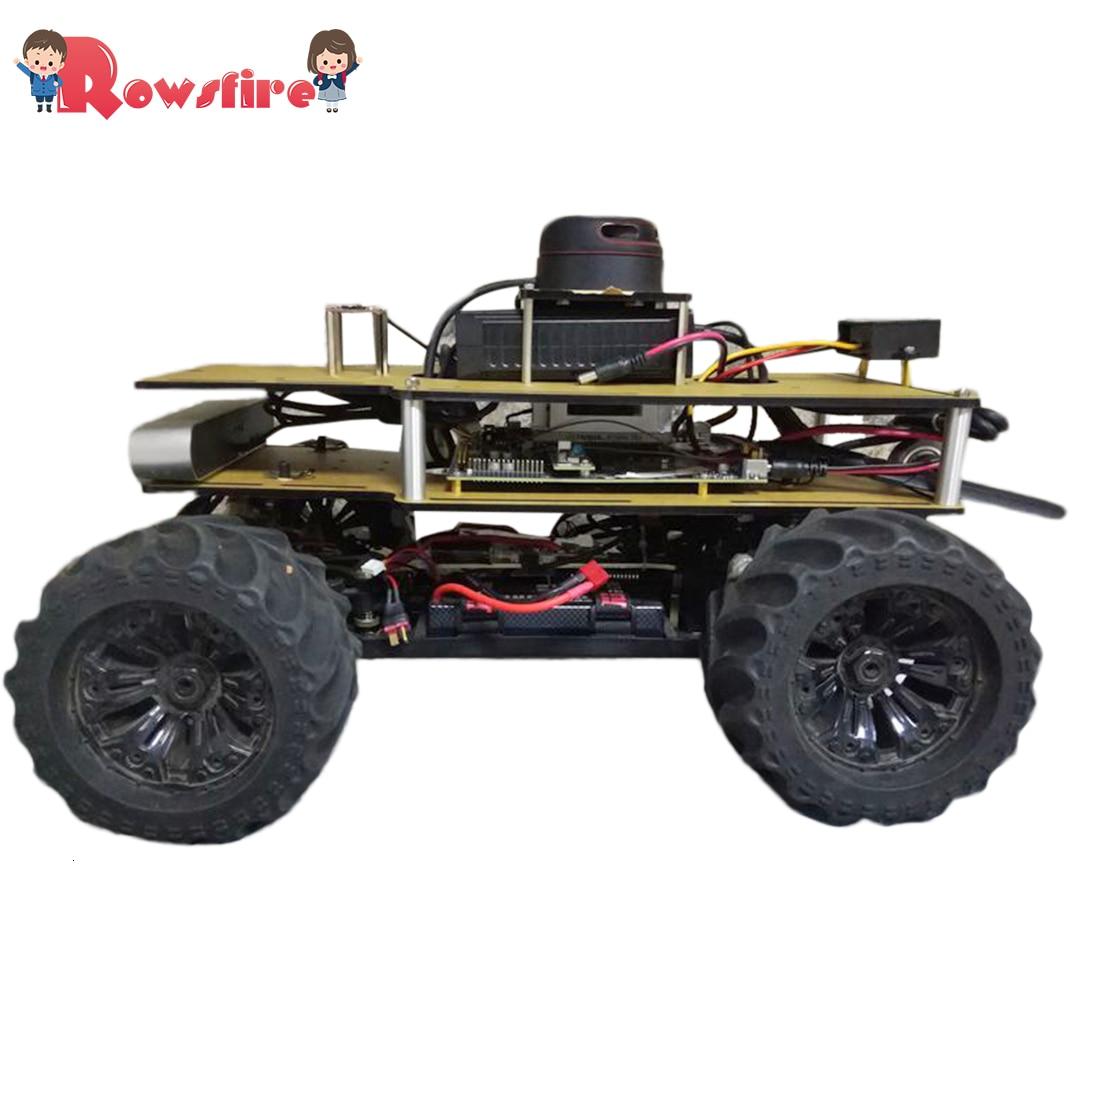 1/10 Programmable ROS Robot Ackerman Suspension Autopilot Ride Kit For Jetson TX2 - Outdoor Version/Indoor Version/Basic Version